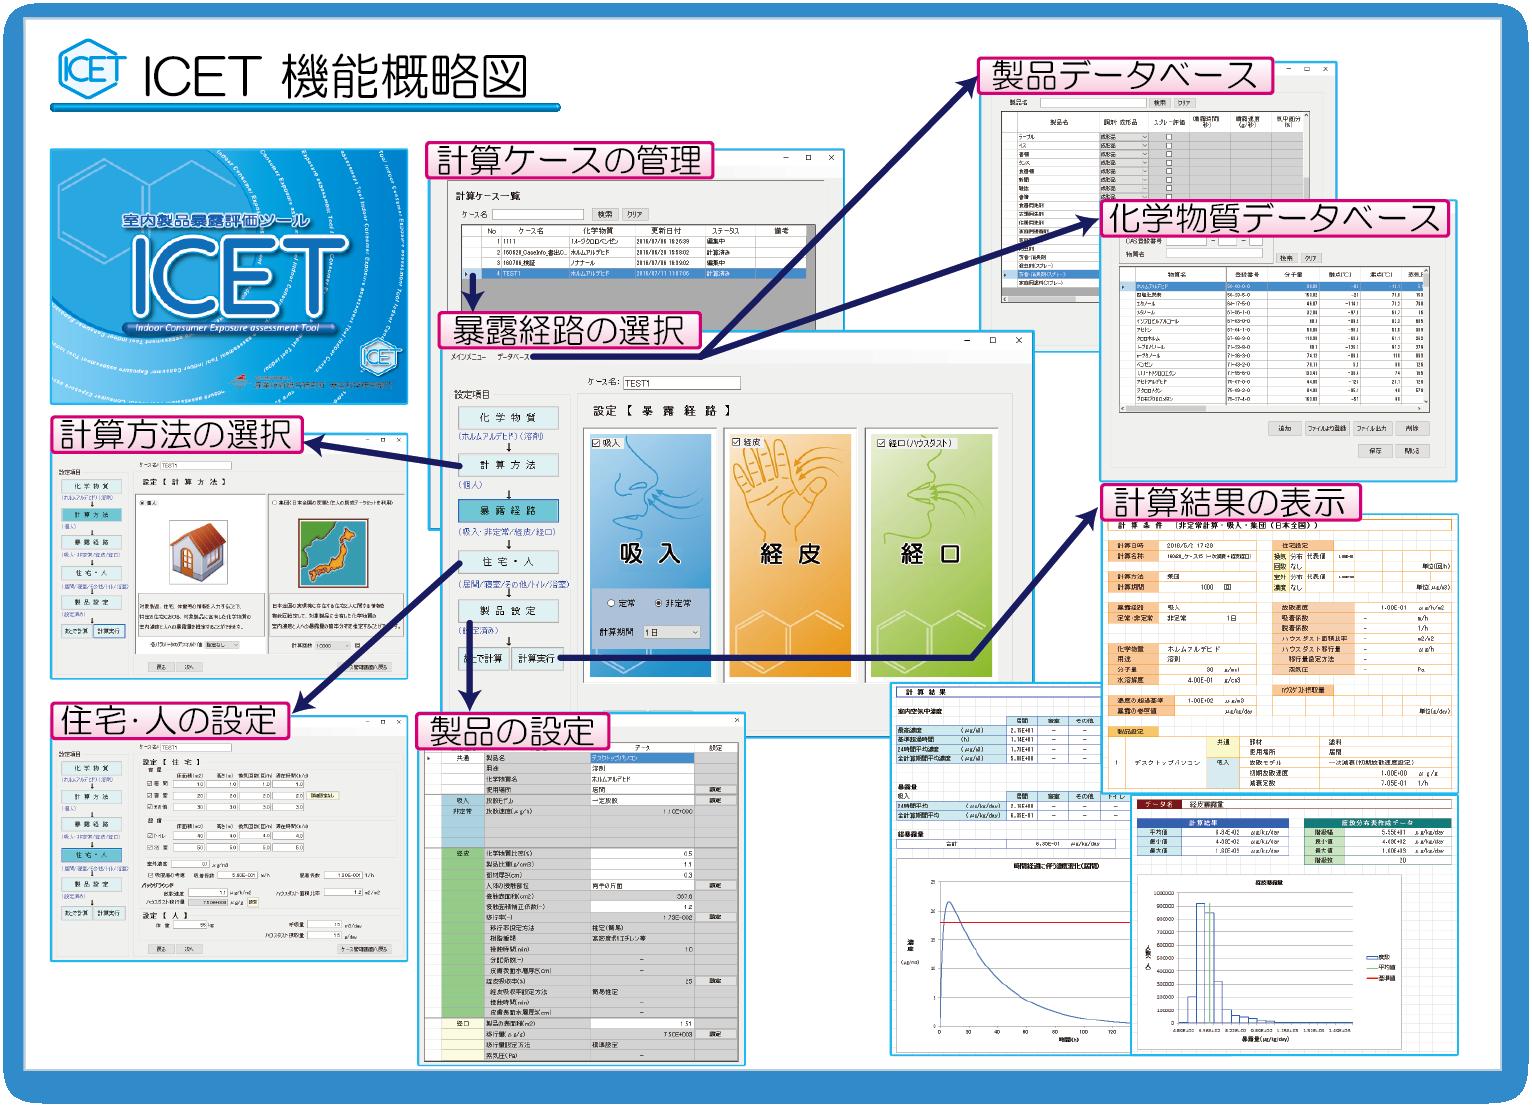 ICET_HP_Gairyaku